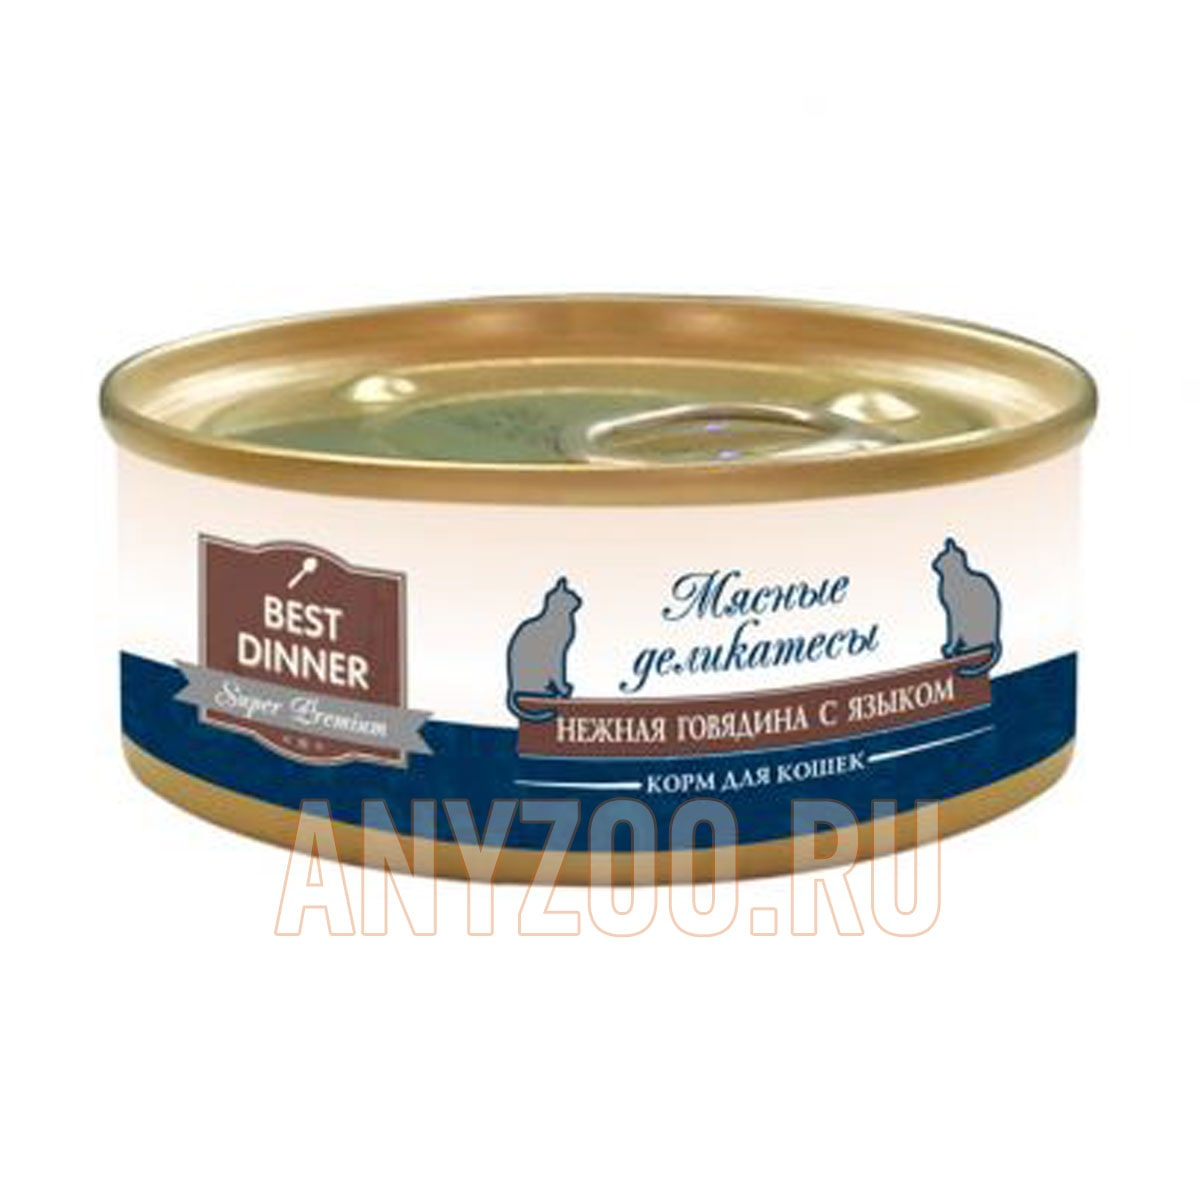 Корм Четвероногий Гурман каша гречневая с морковью 3kg 46403